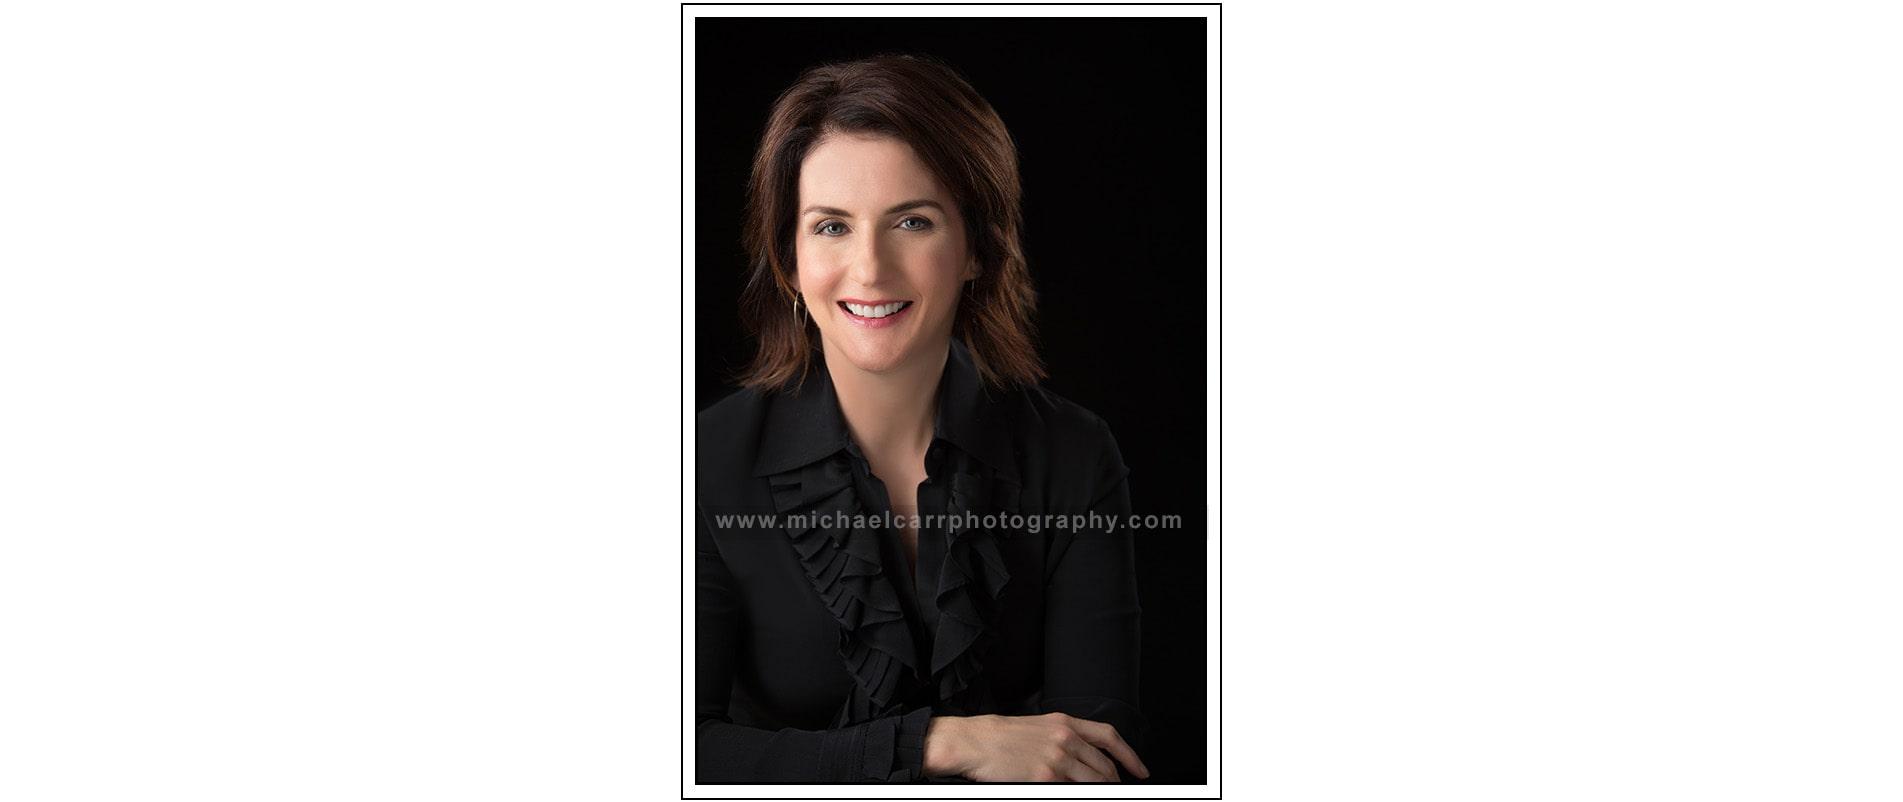 Women Contemporary Business Portraits